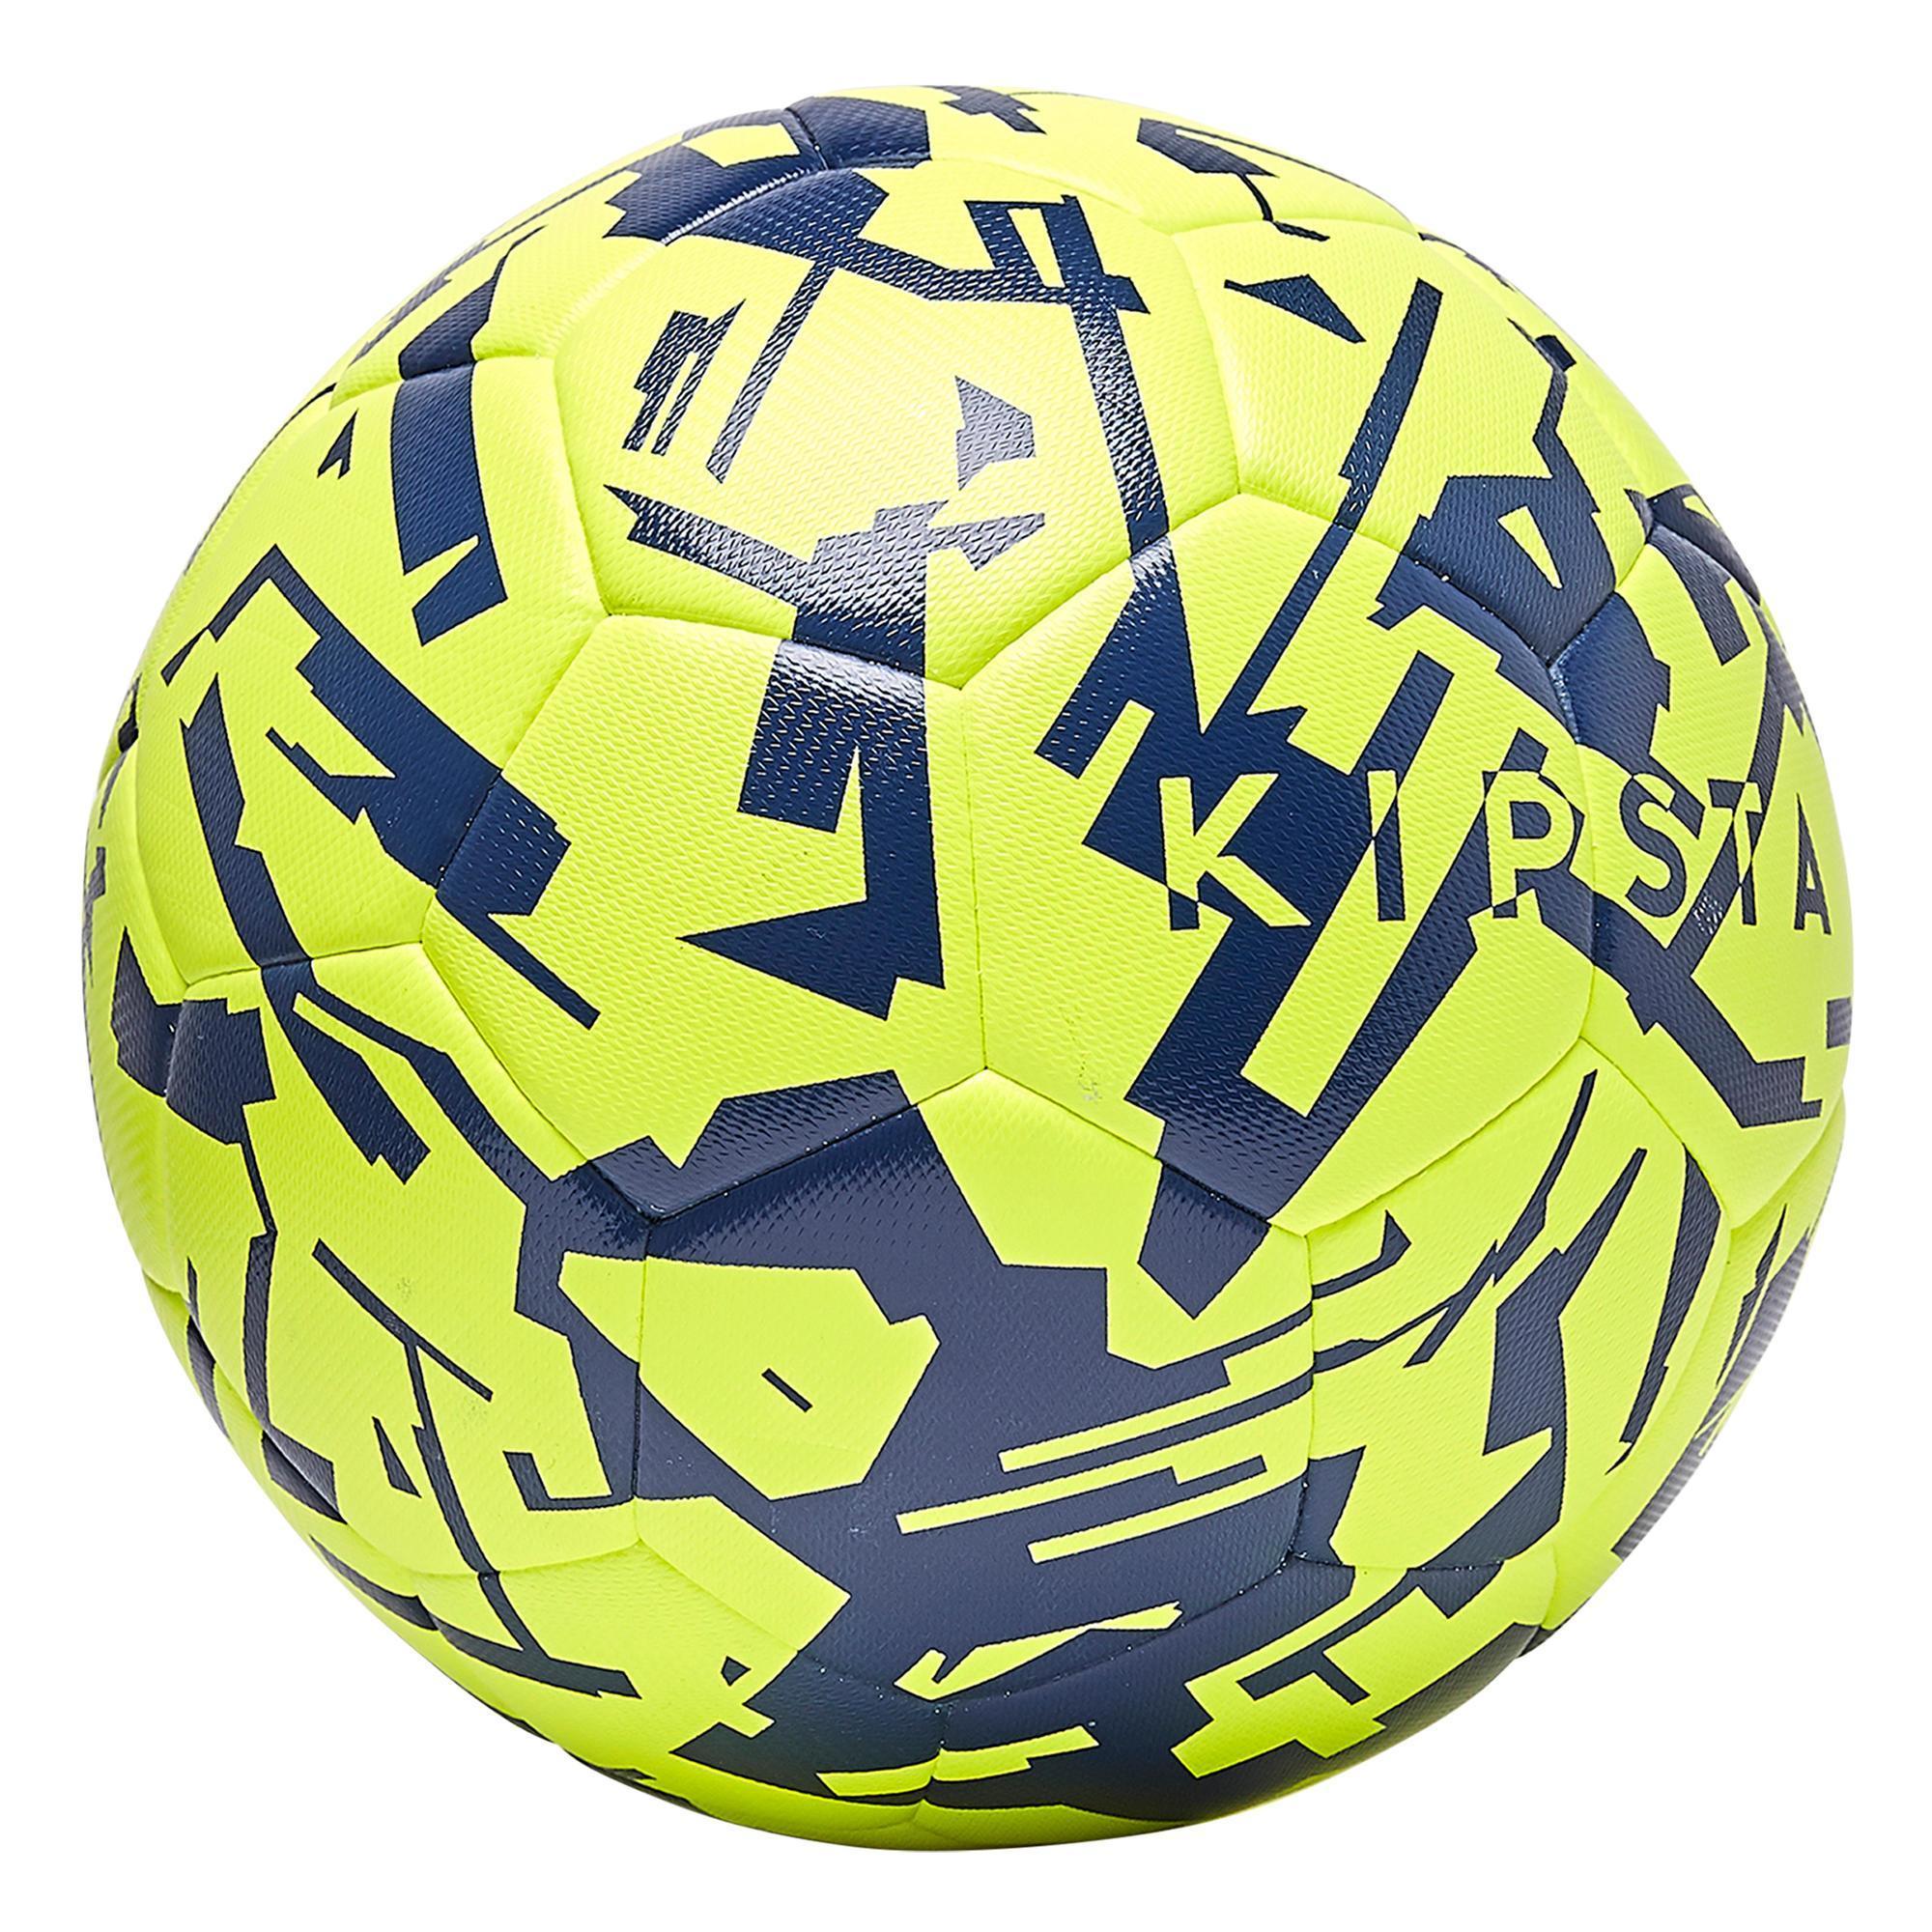 Comprar balones de fútbol ocio pelotas foam decathlon jpg 2000x2000 Kipsta  pelotas de nino e5a49ab3c3efe